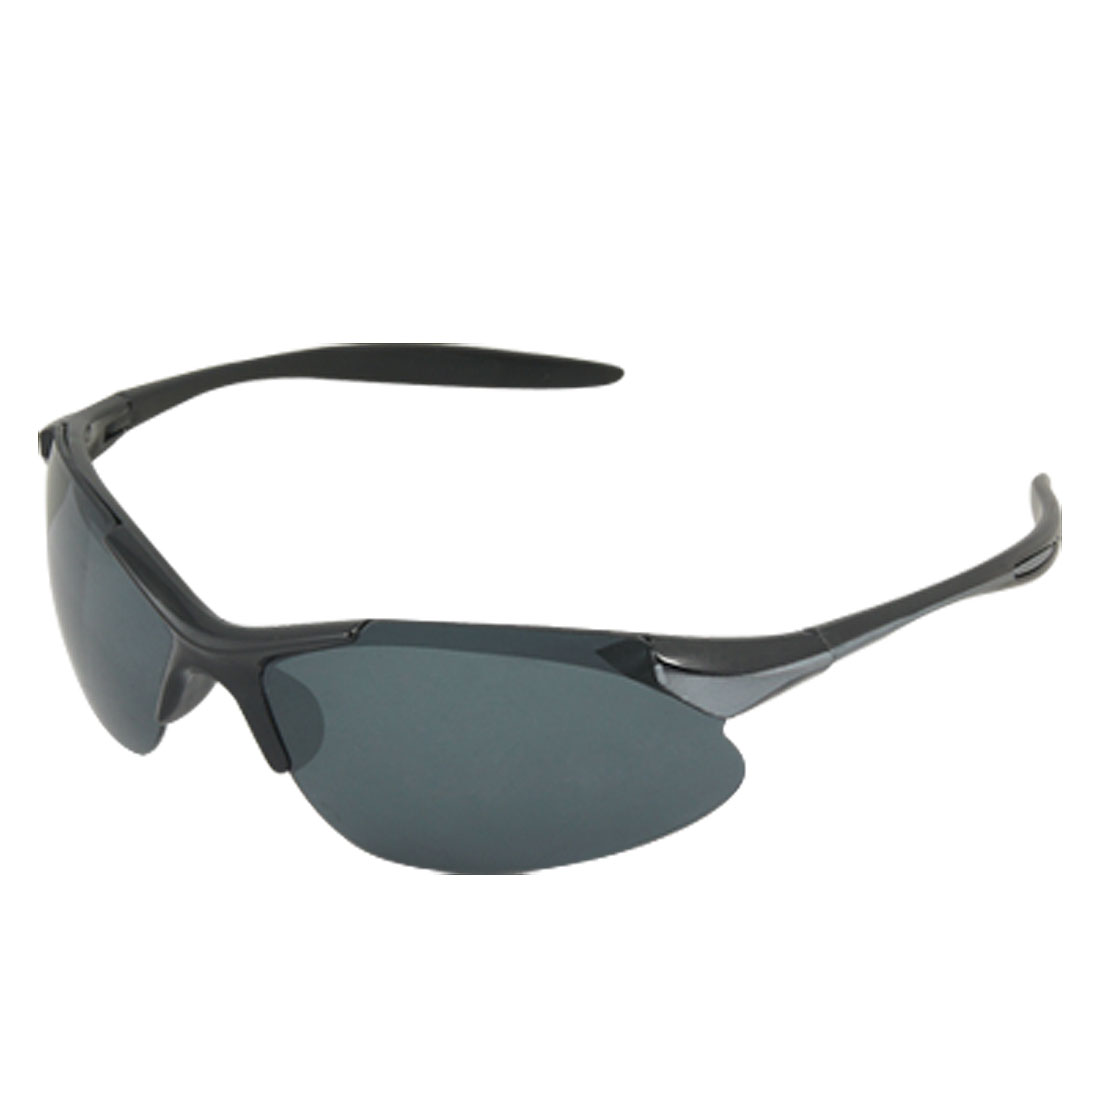 Two Tone Plastic Arms Dark Blue Lens Sports Sunglasses Unisex